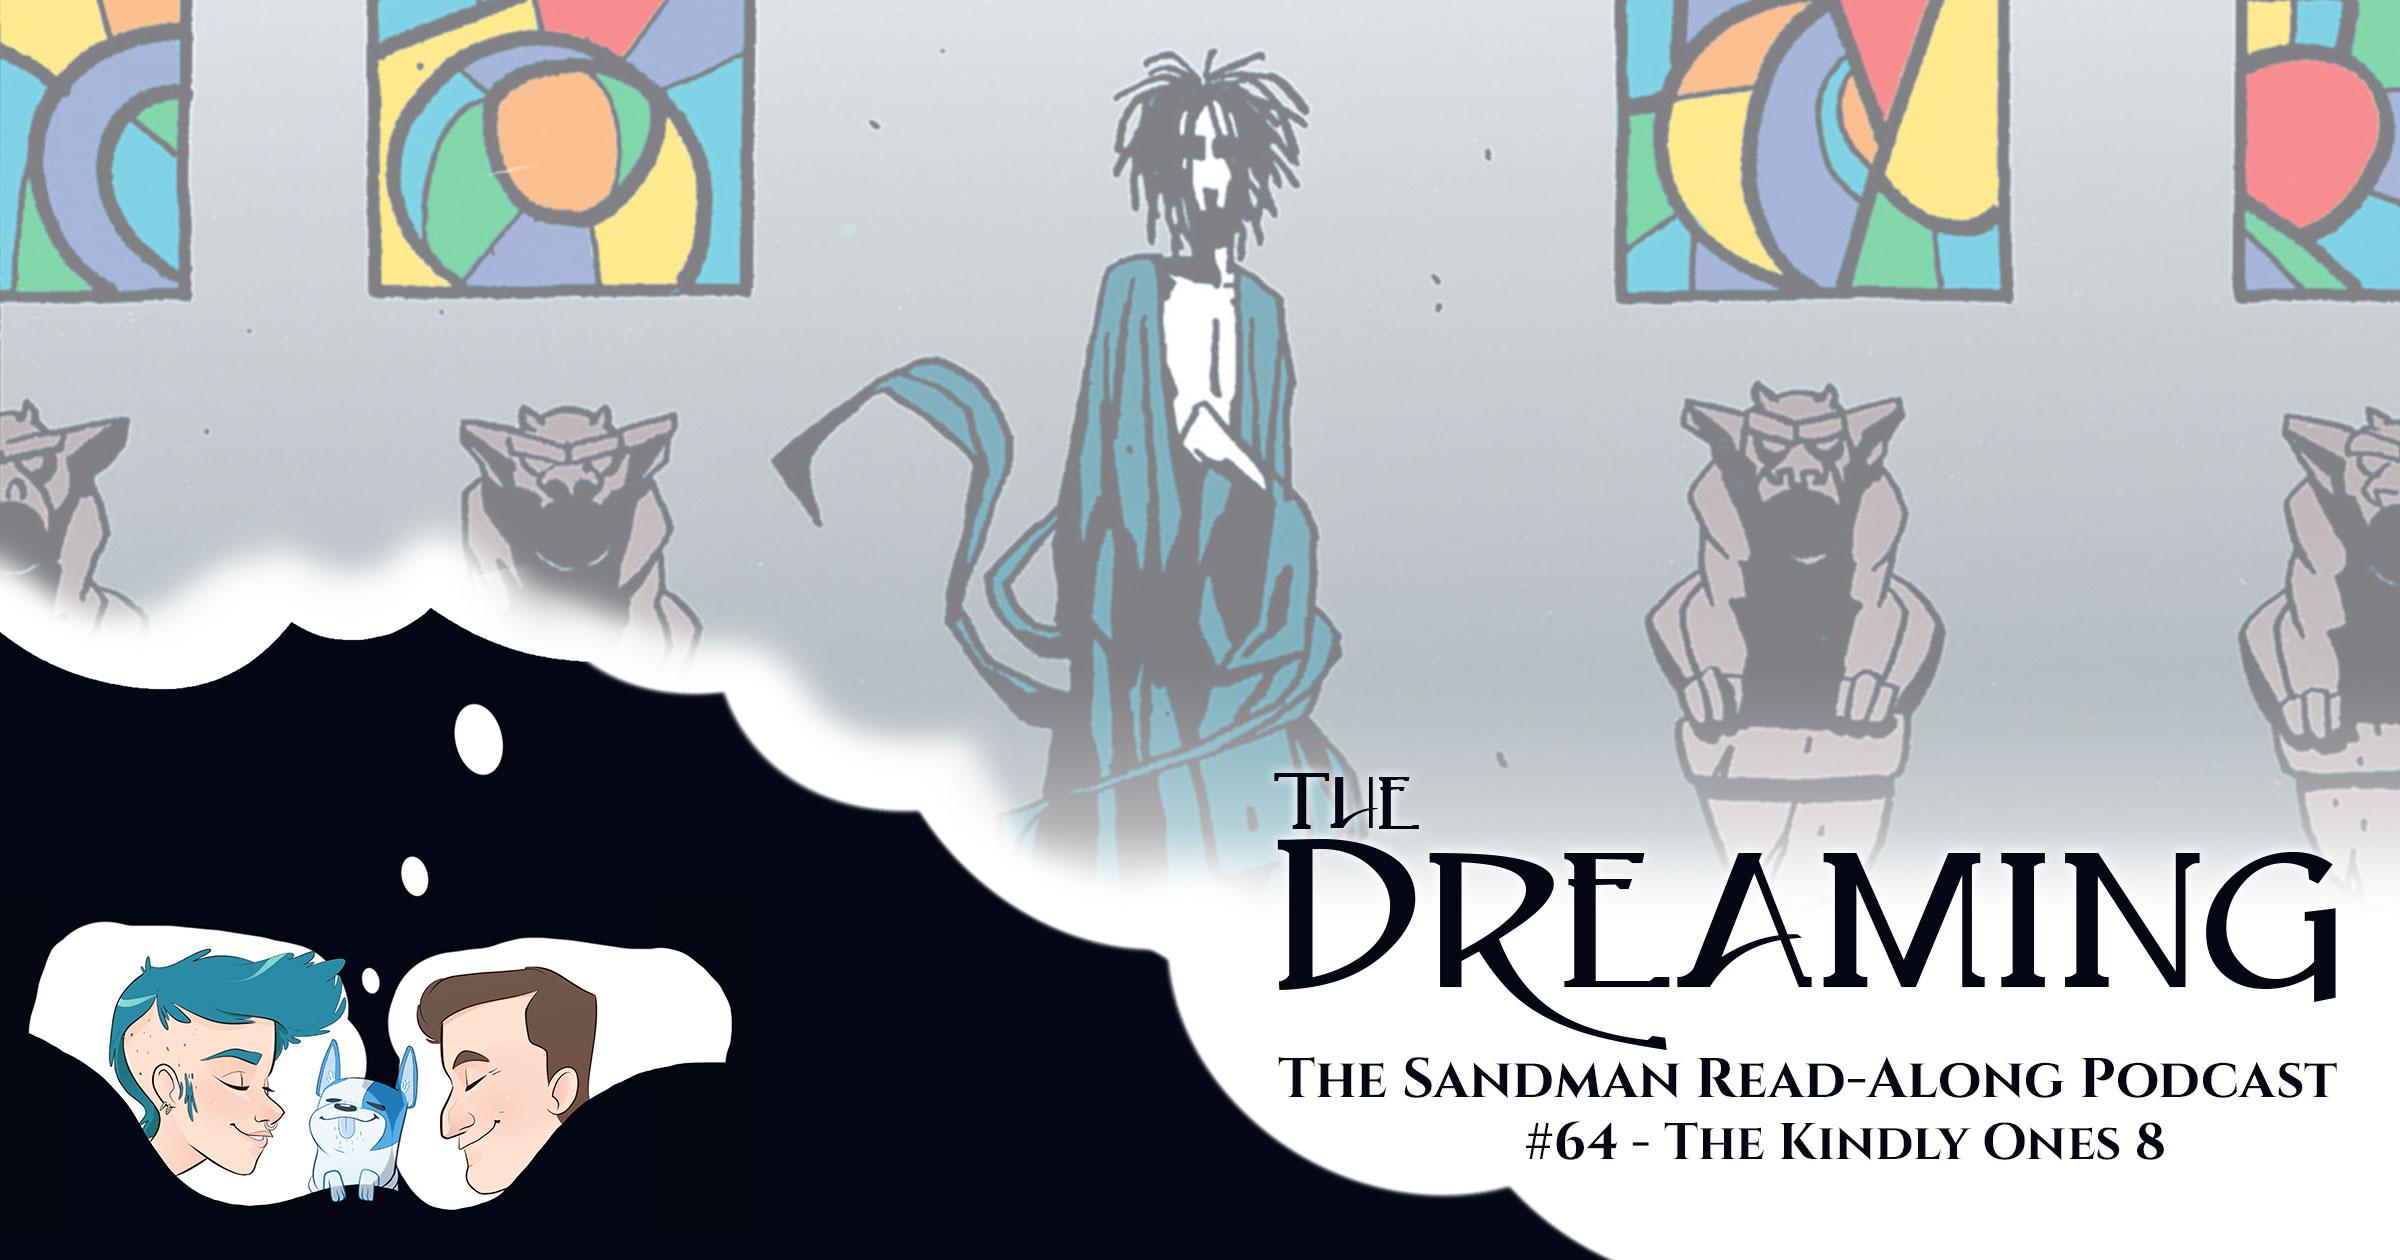 thedreaming-66-thesandman-64-tko8-titlecard